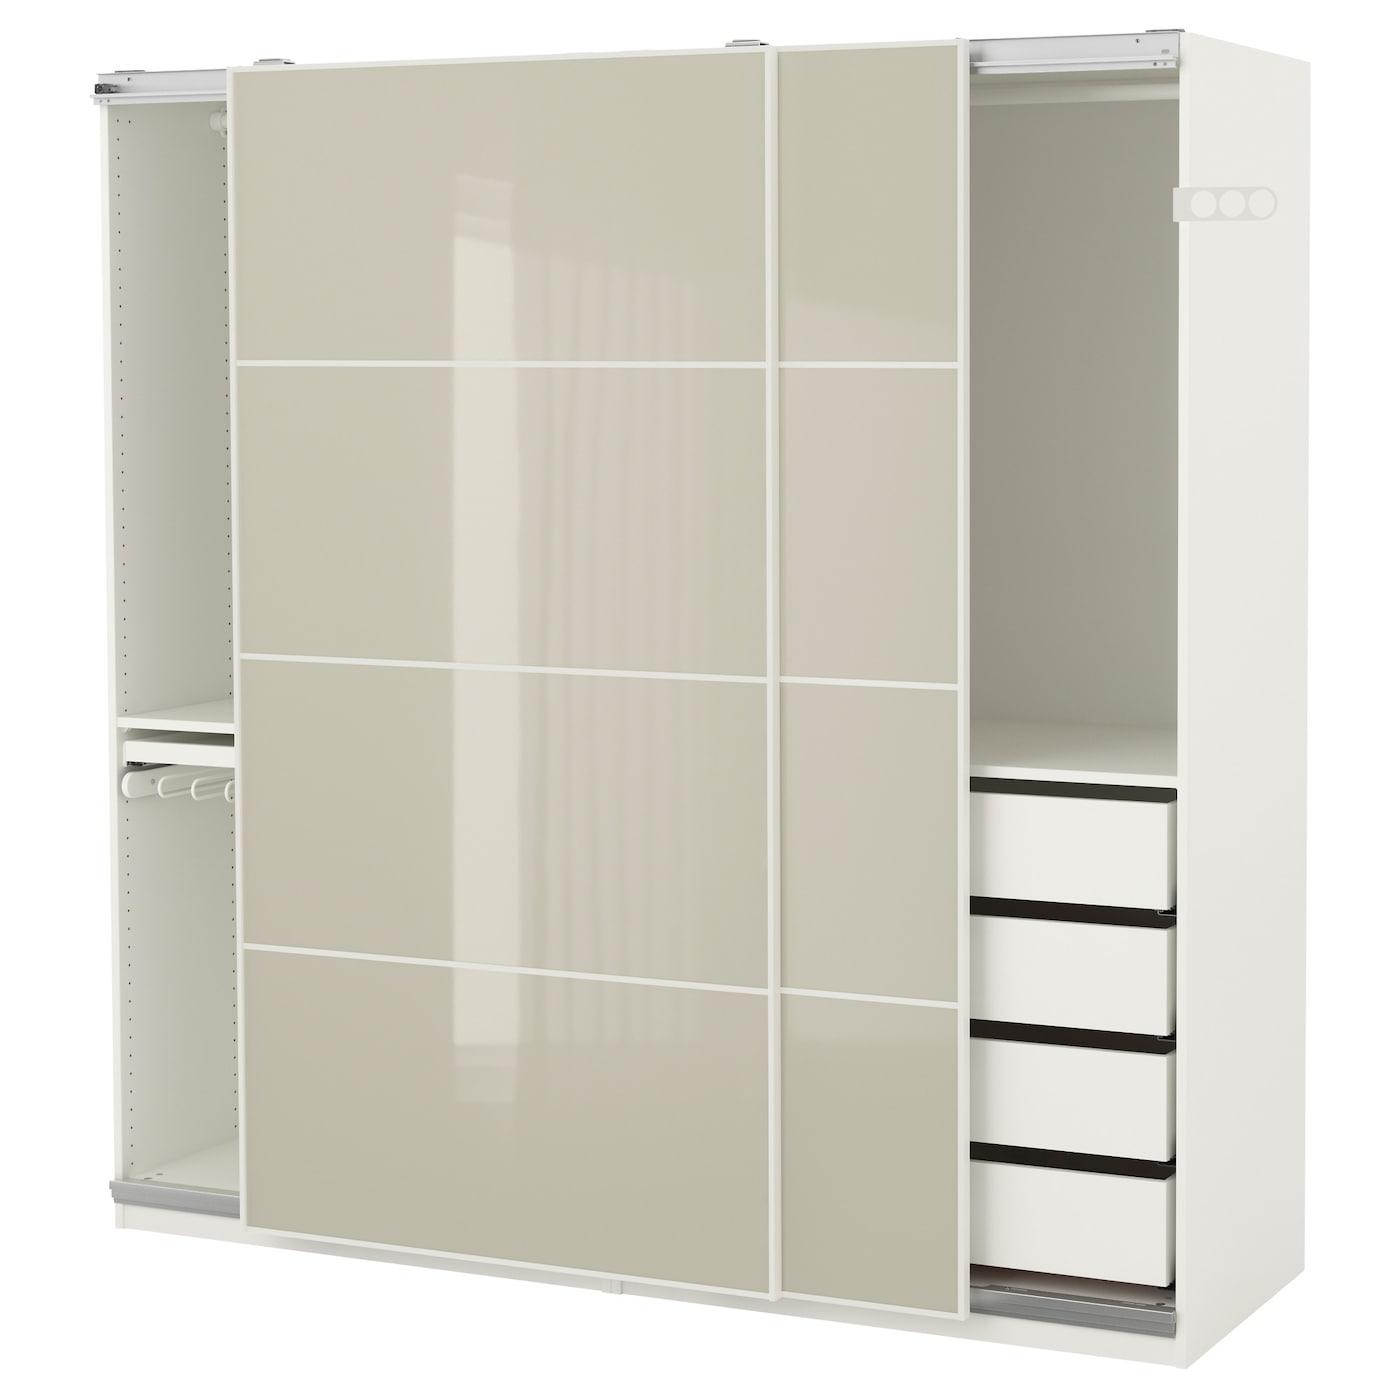 pax armoire penderie blanc hokksund brillant beige clair 200x66x201 cm ikea. Black Bedroom Furniture Sets. Home Design Ideas